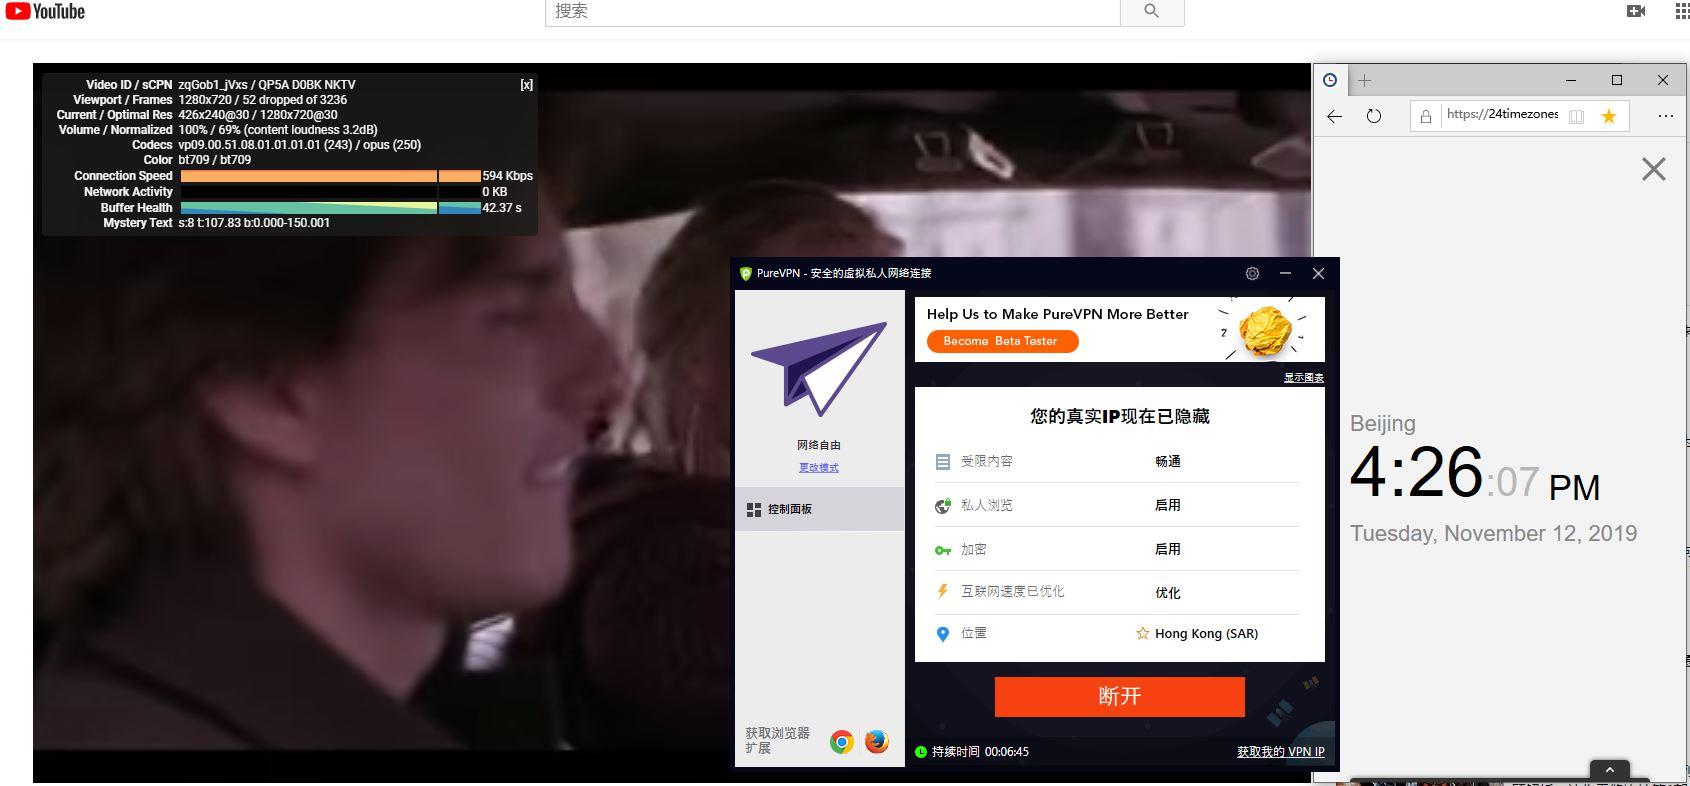 Windows PureVPN Hong Kong 中国VPN翻墙 科学上网 Youtube测速-20191112